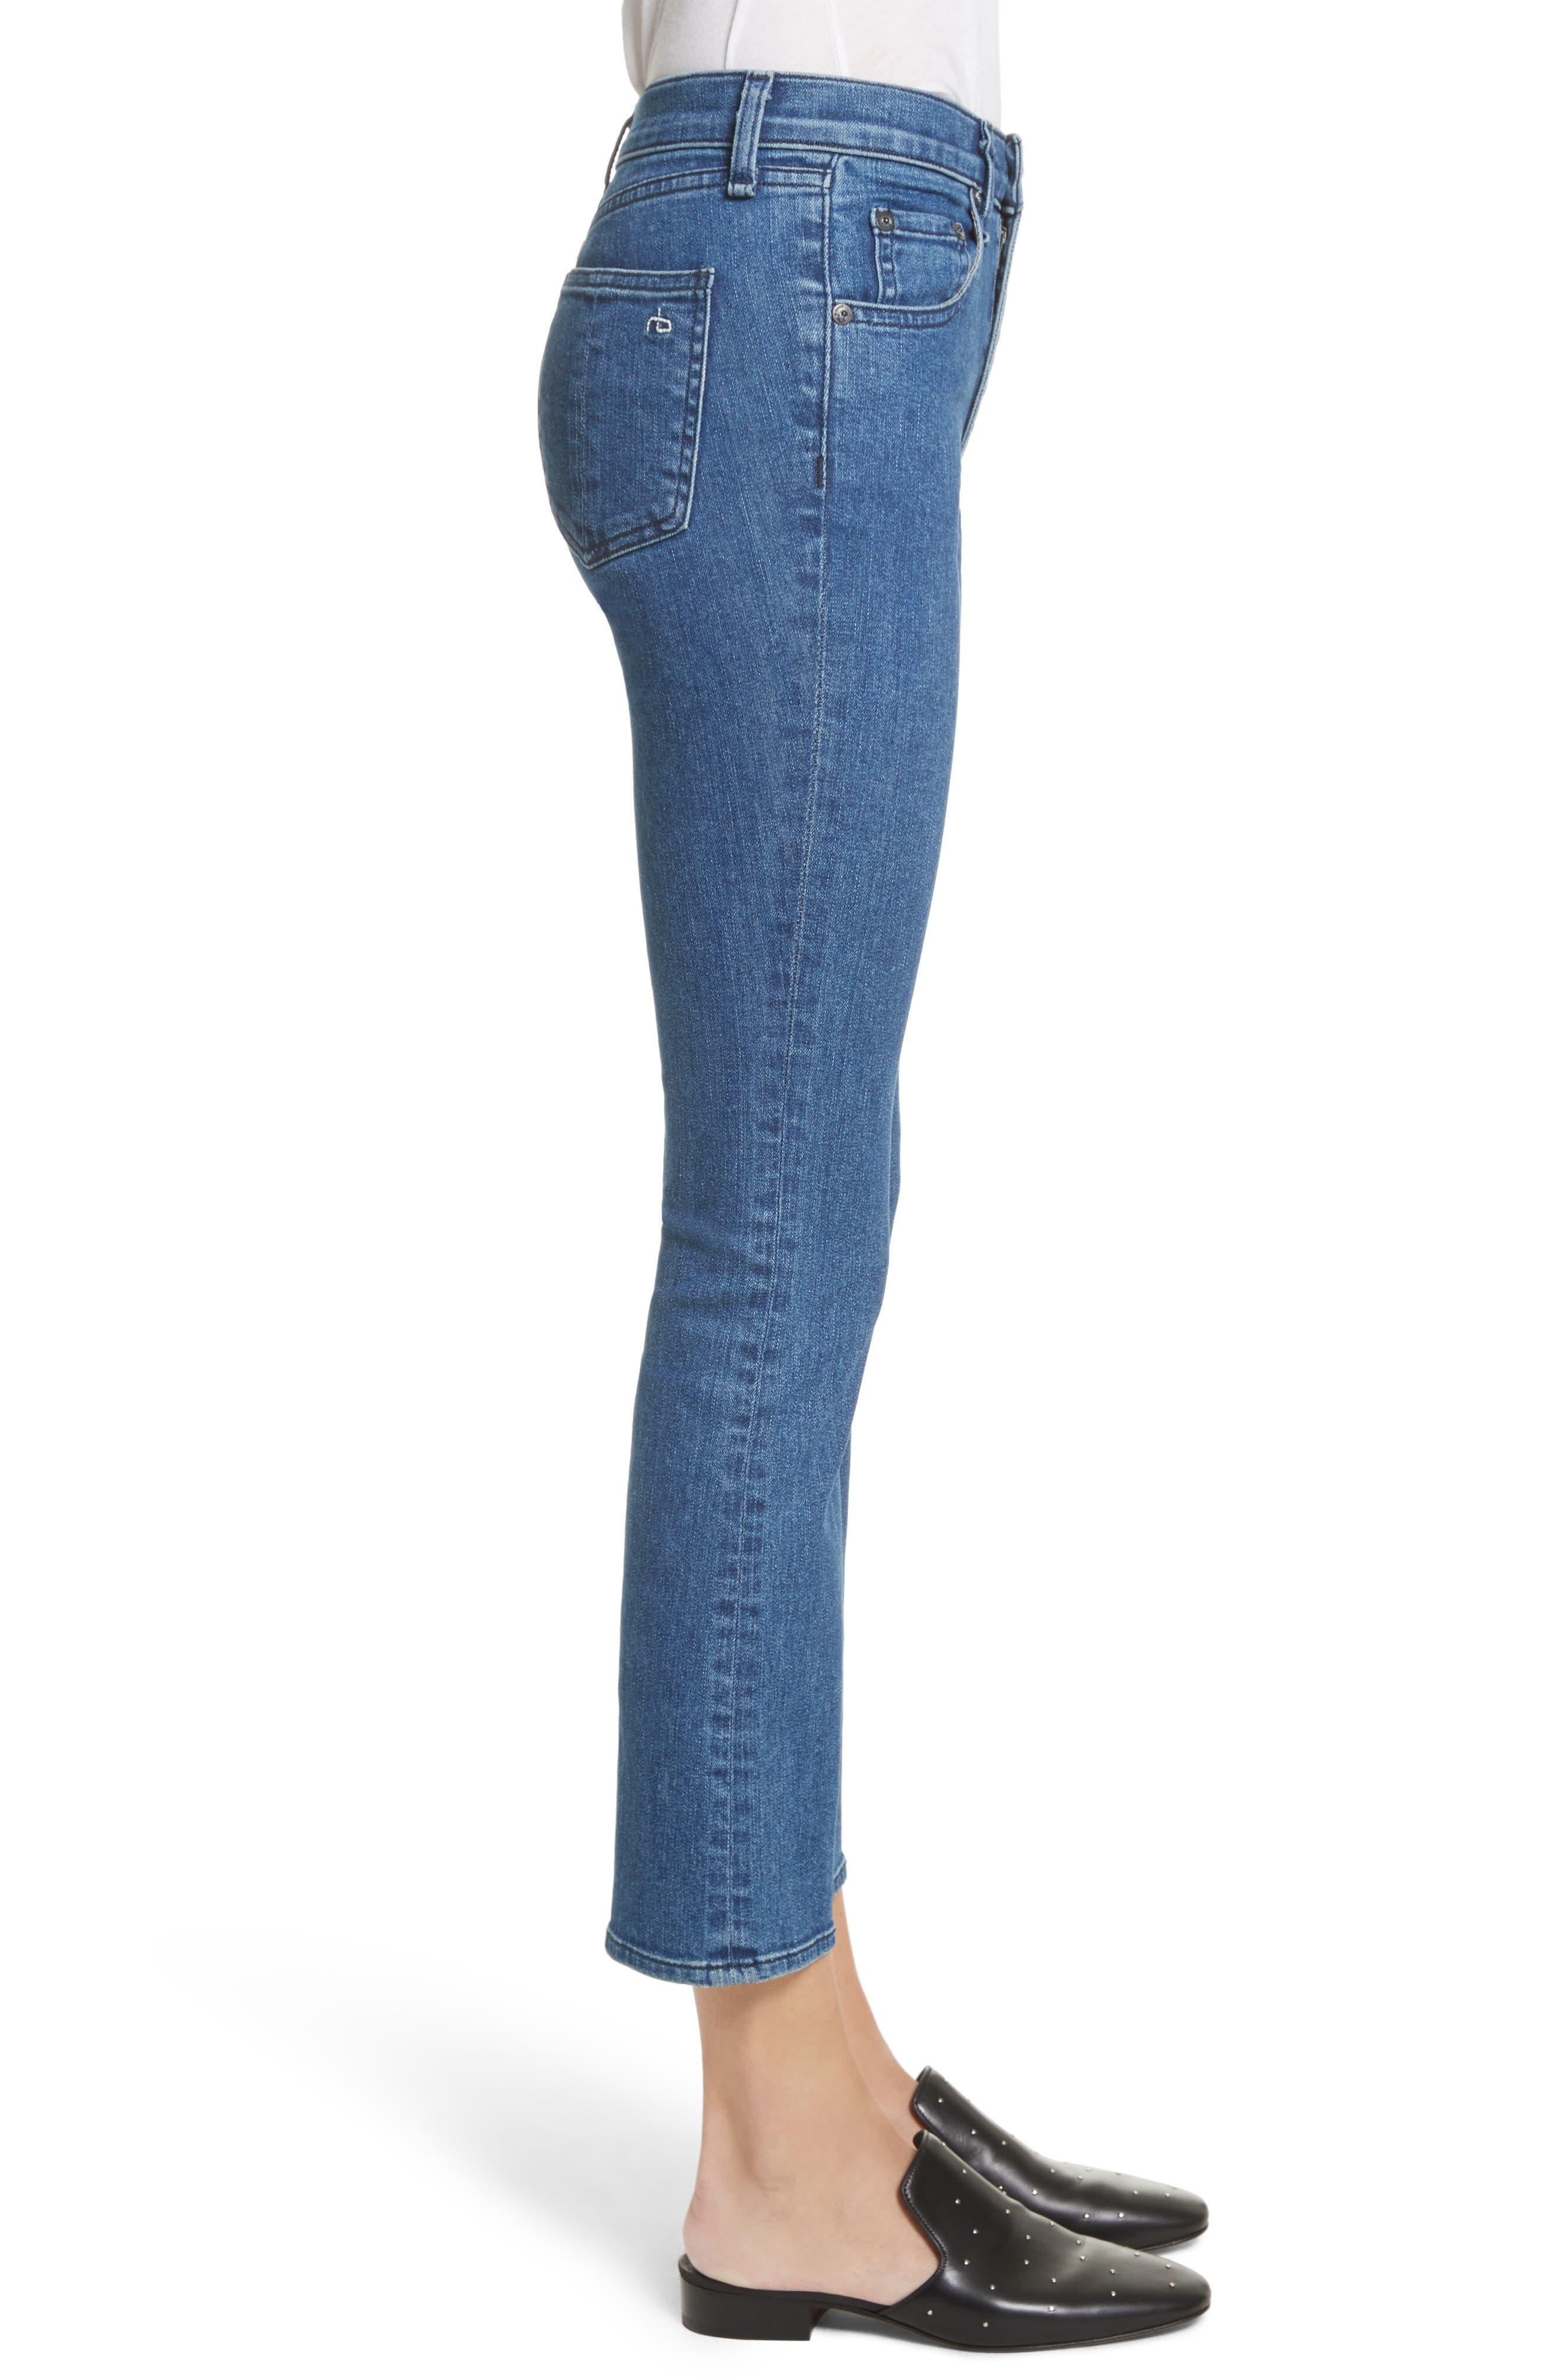 Hana High Waist Crop Bootcut Jeans,                             Alternate thumbnail 3, color,                             420